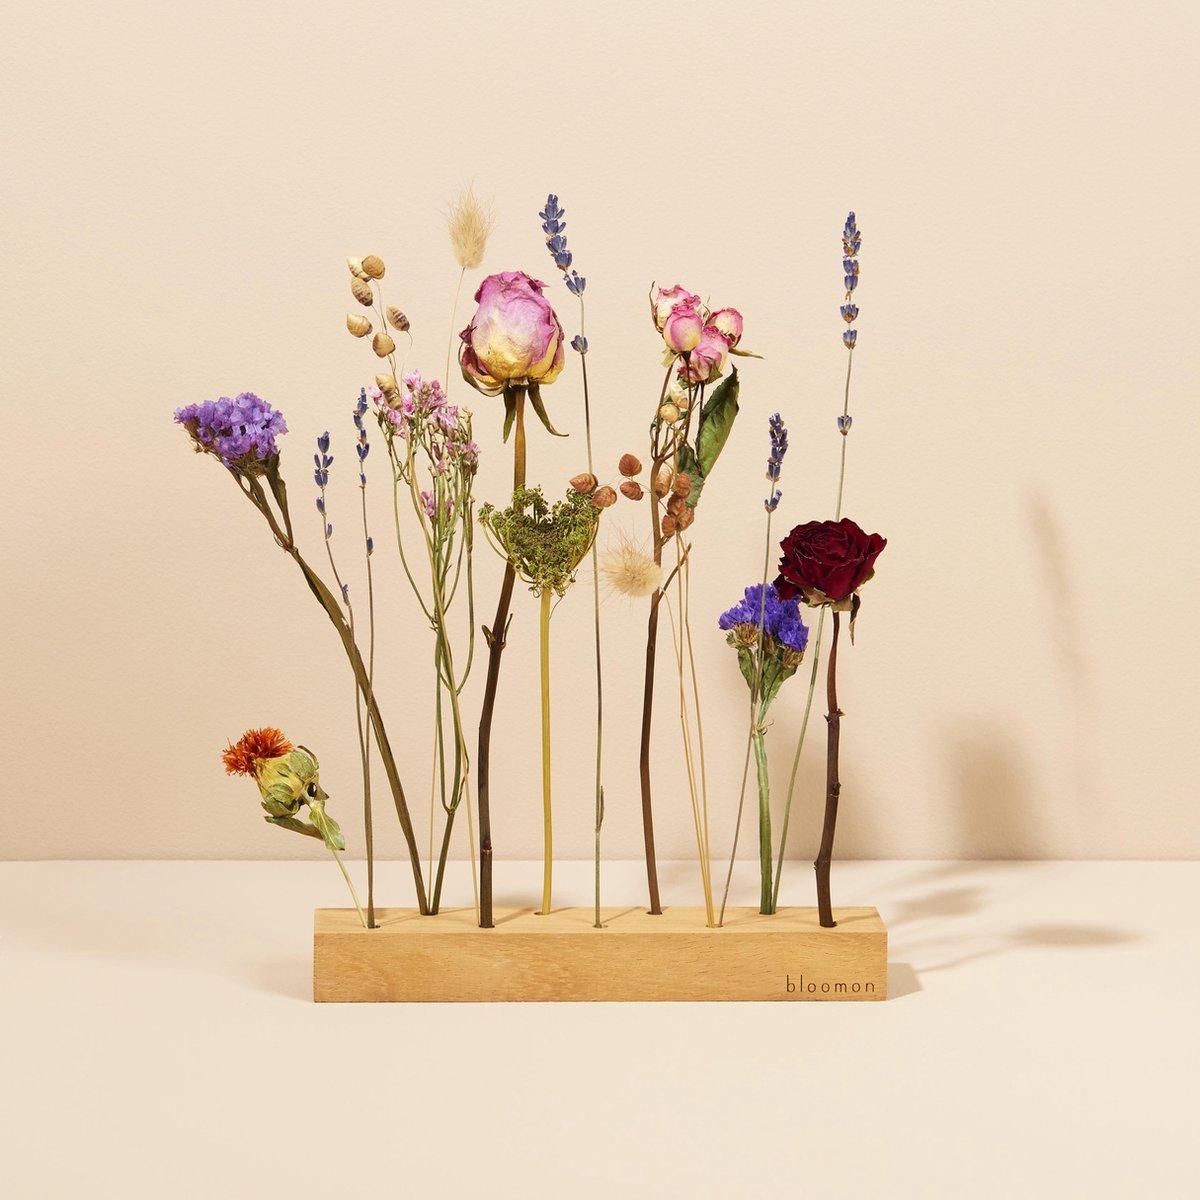 bloomon   Flowergram   Sweet Candy   Unieke brievenbus droogbloemen